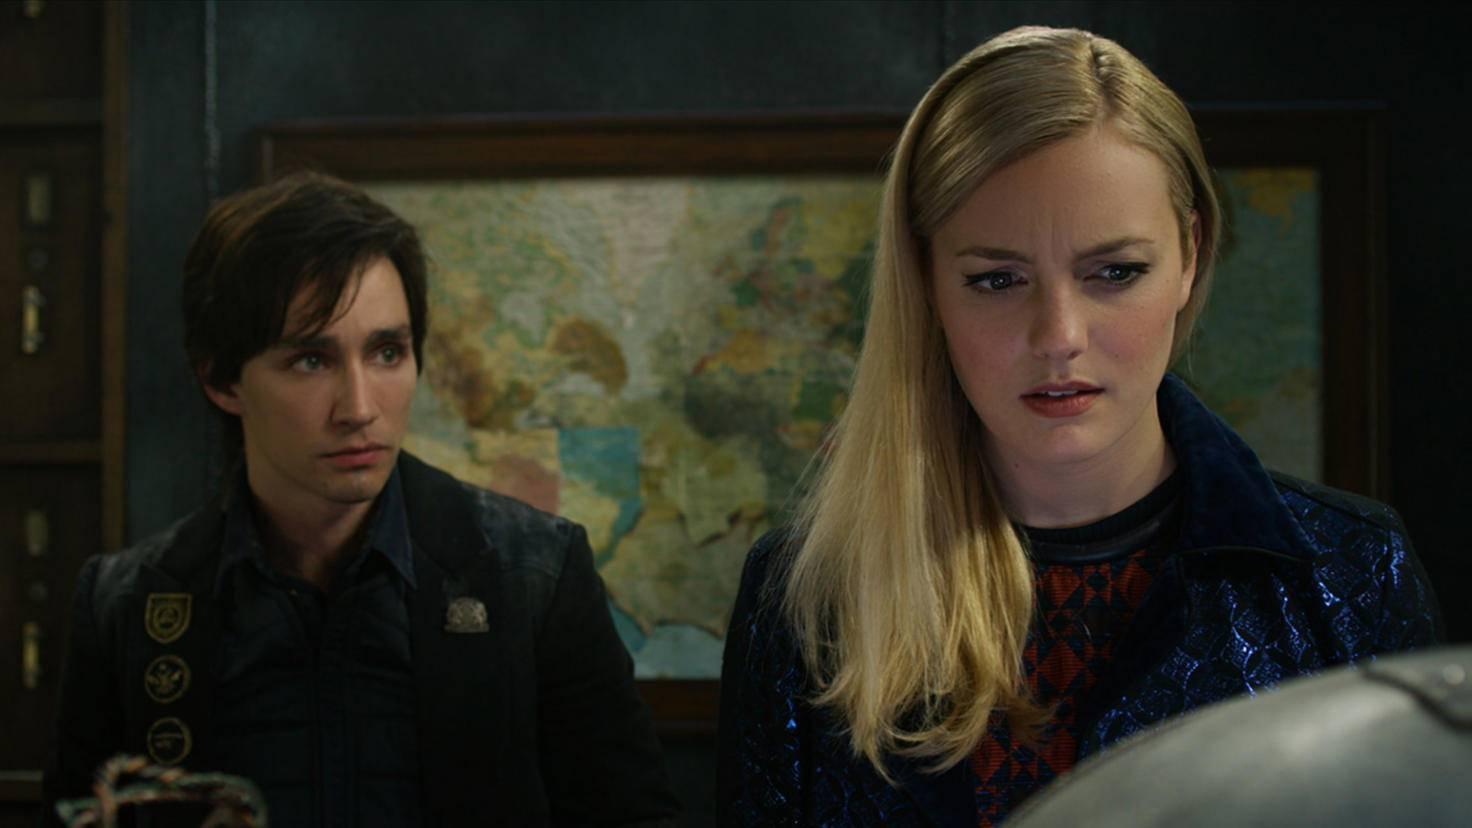 Tom (links) und Katherine (rechts)